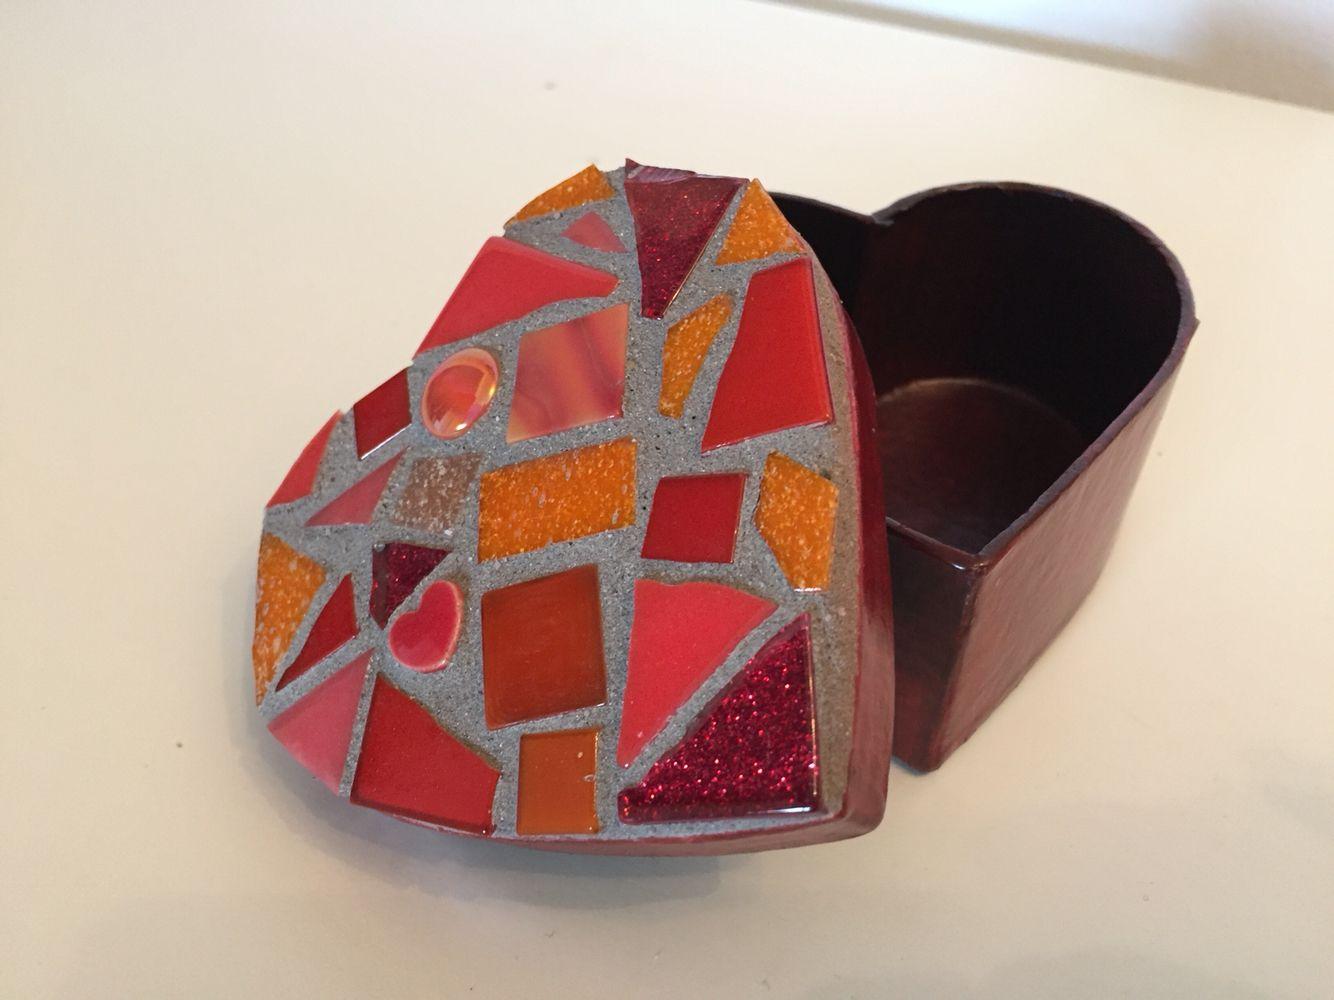 Handmade mosaic heart trinket box incorporating different shades of red and orange #handmade #mosaic #jewellery #trinkets #pretty #heart #love